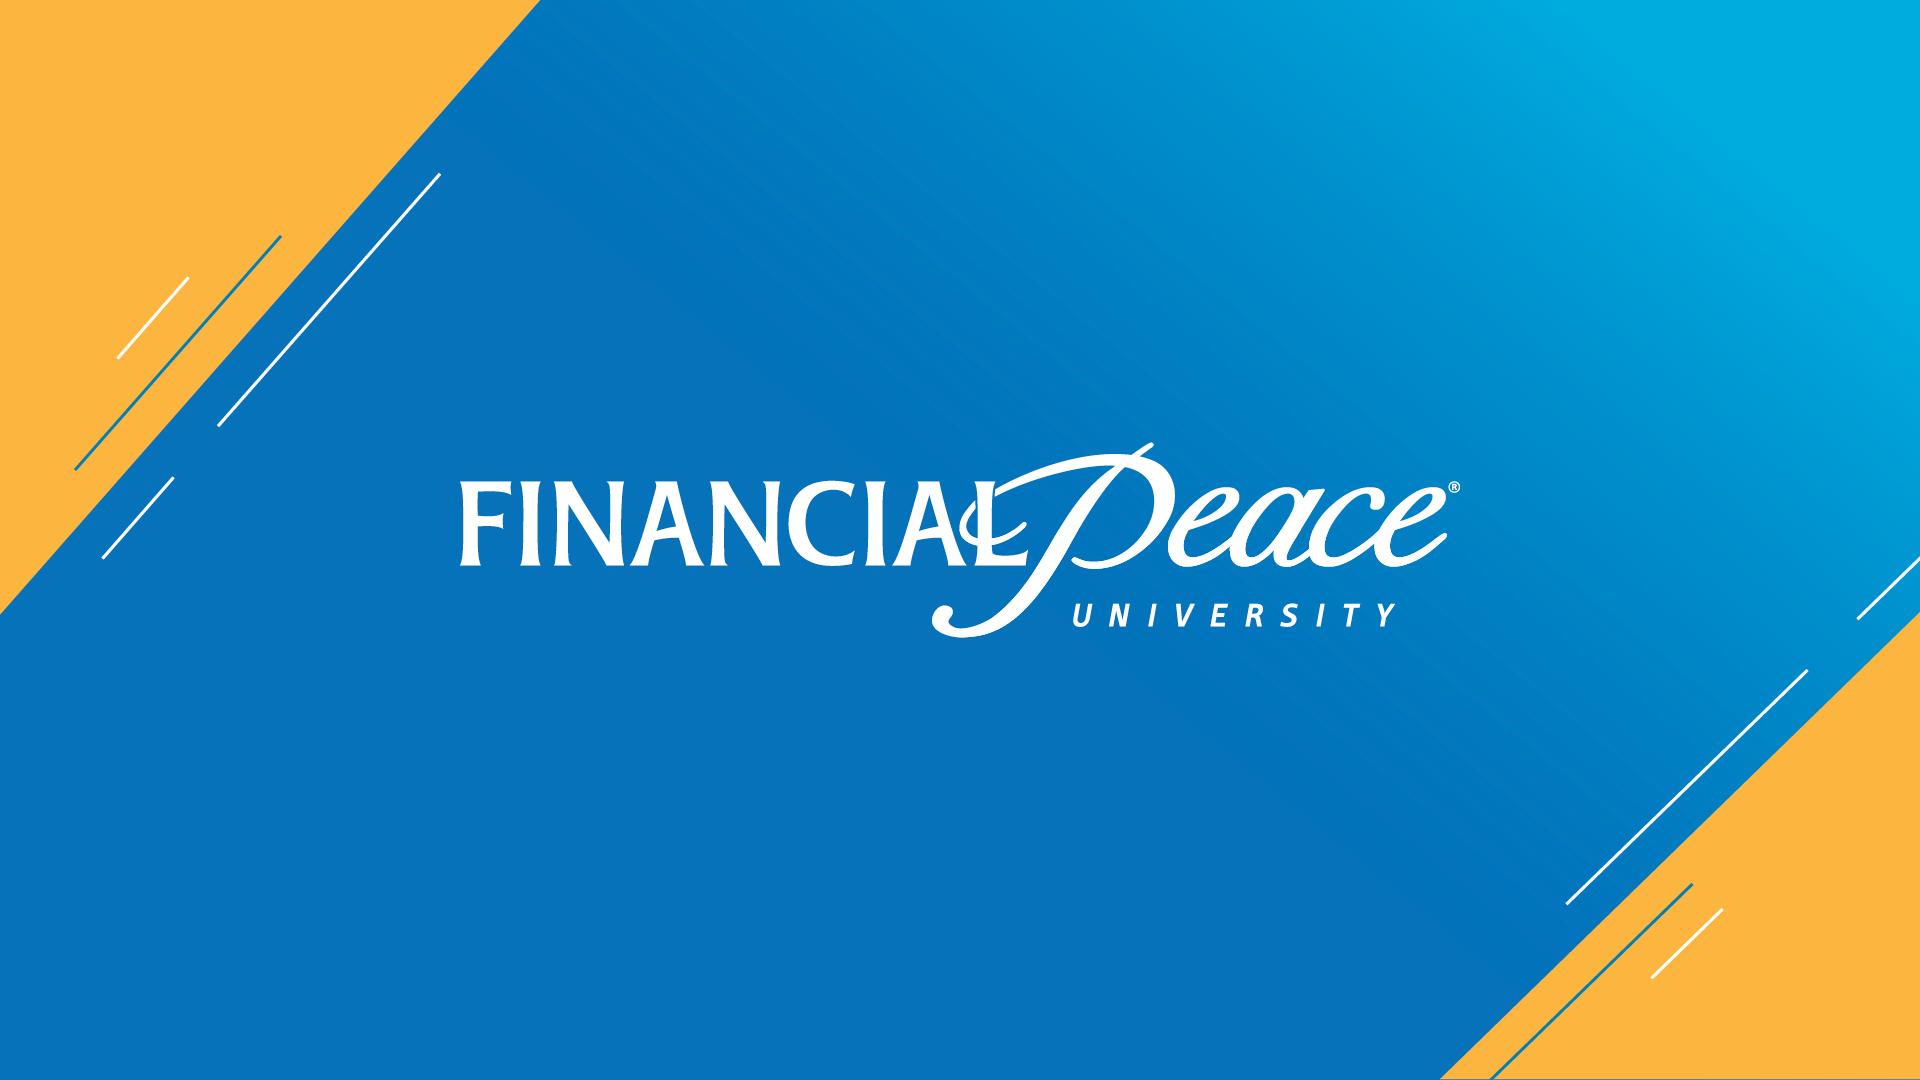 financial-peace-slide-logo.jpg